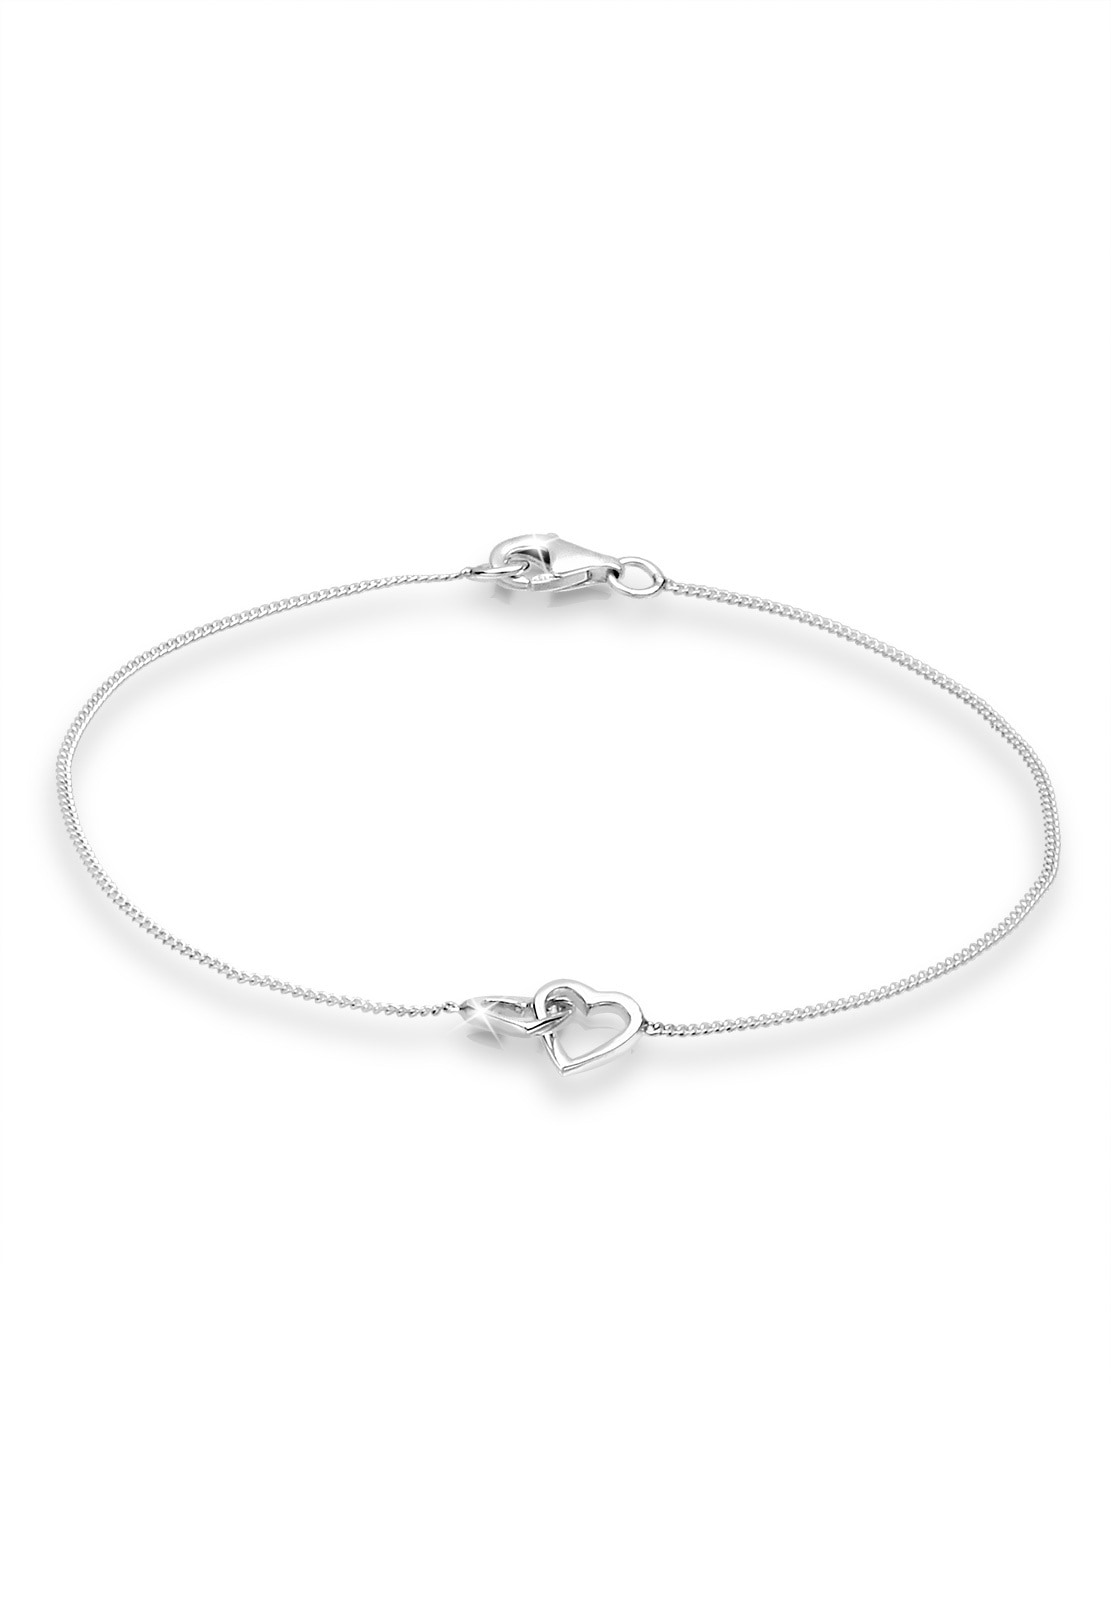 Elli Armband Herz Heart Verschlungen 925 Sterling Silber | Schmuck > Armbänder > Silberarmbänder | Elli